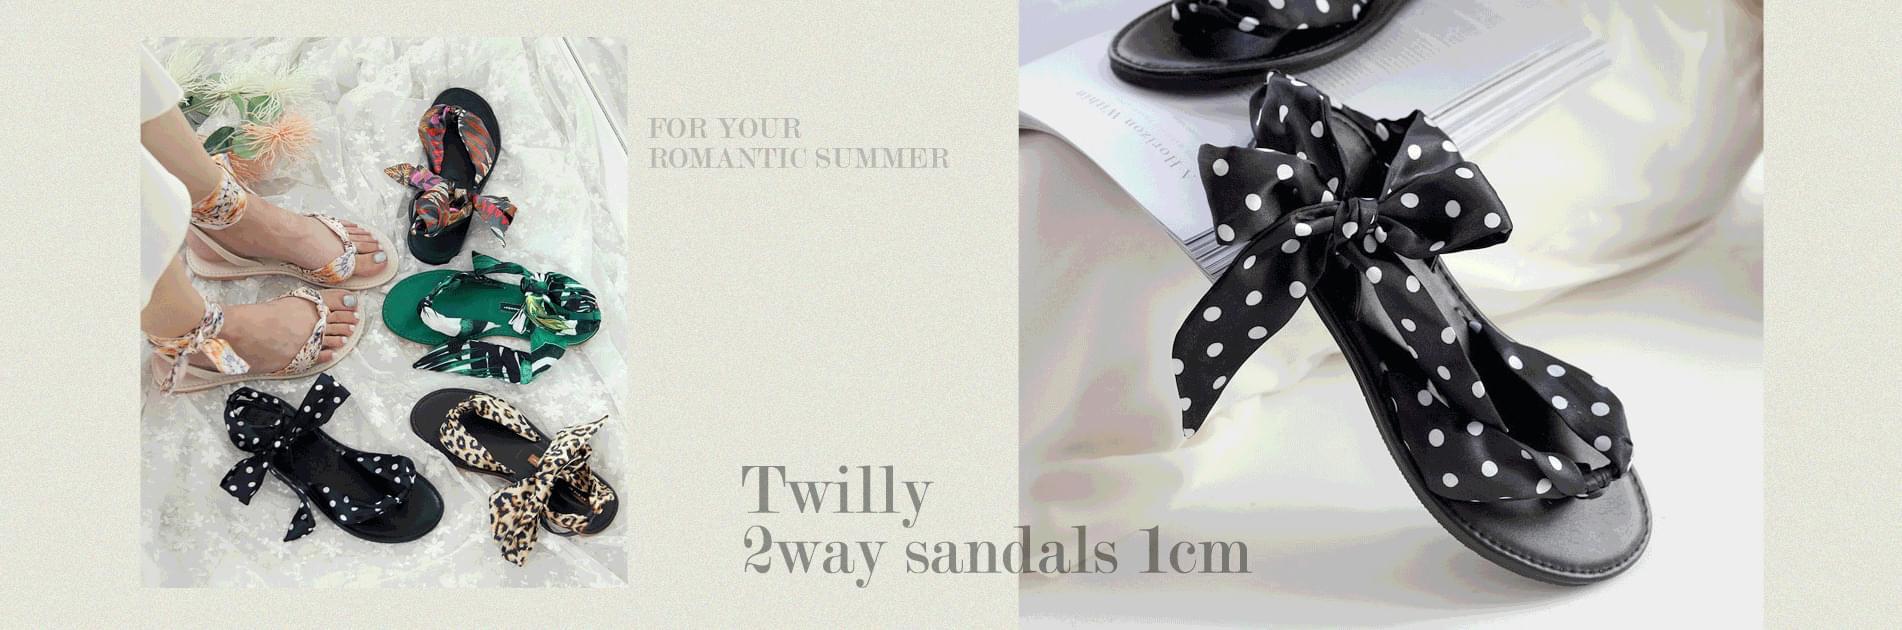 Twilly 2 way sandals 1 cm